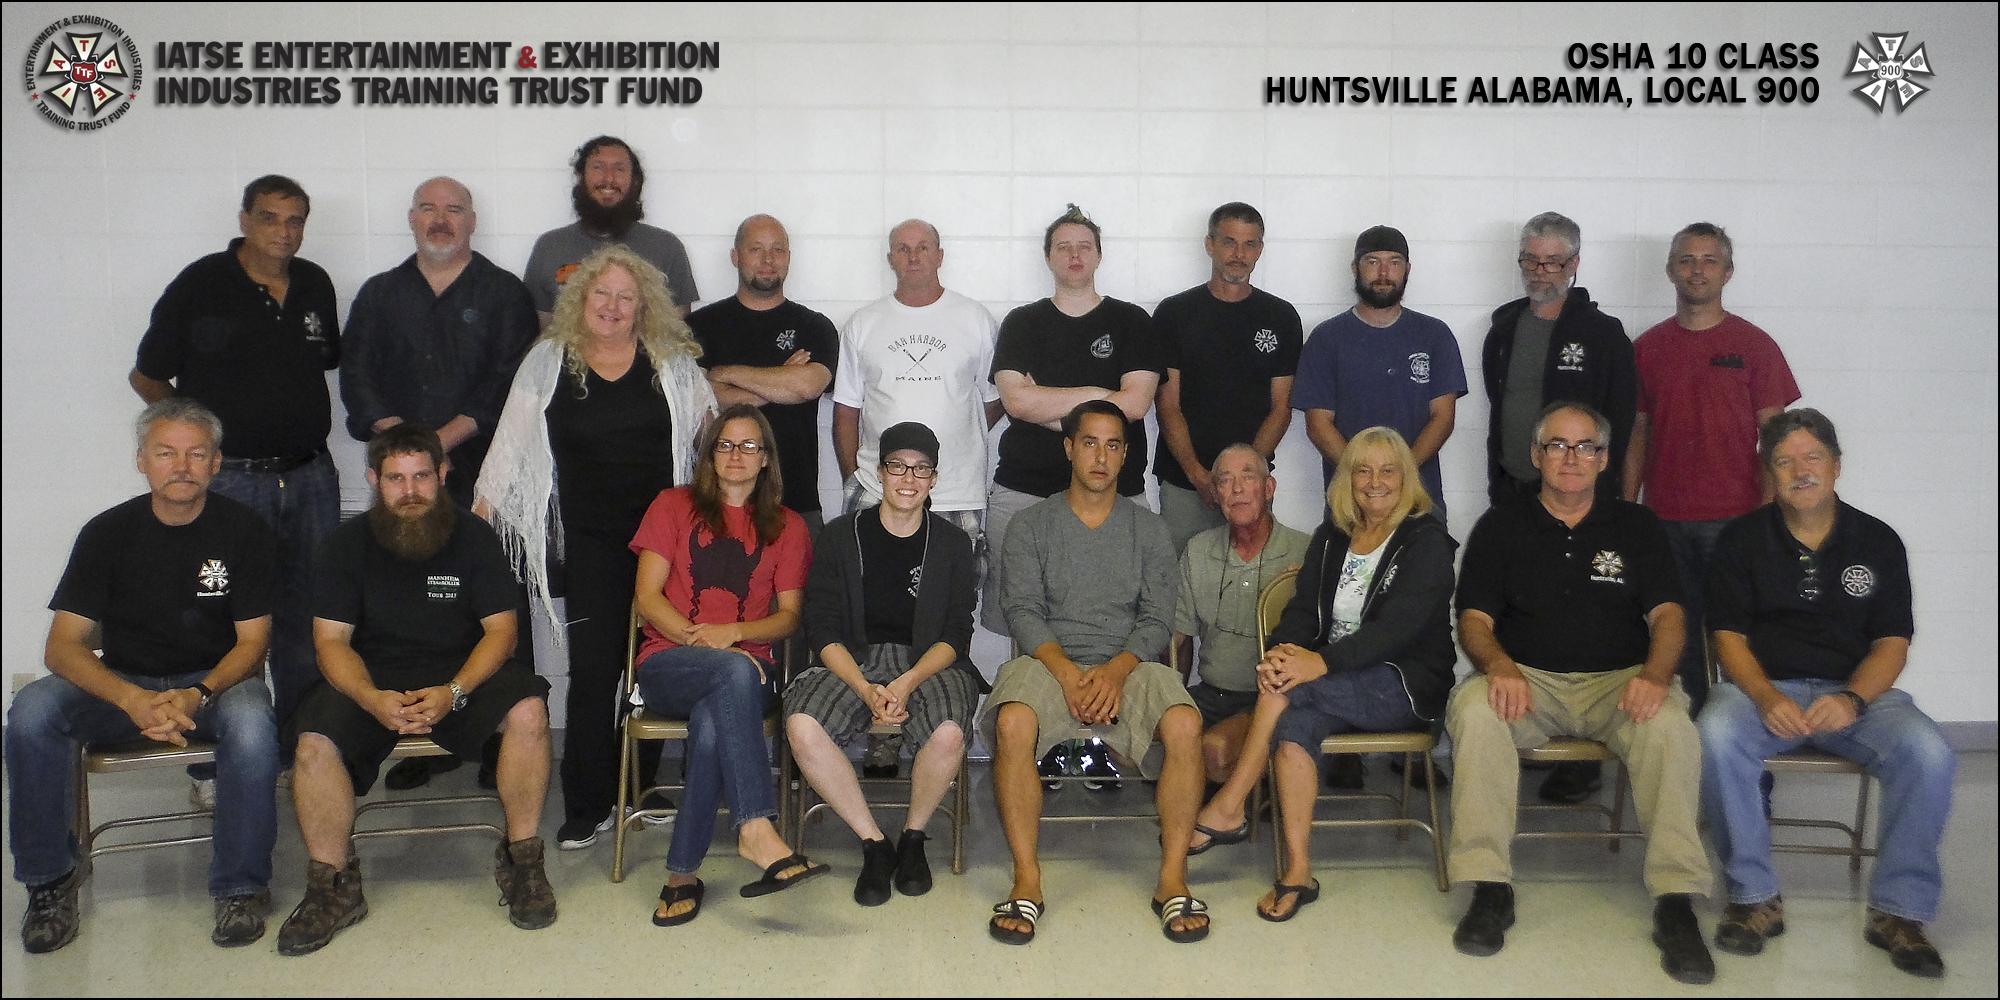 OSHA 10/General Entertainment Safety in Huntsville, AL | August 30, 2015